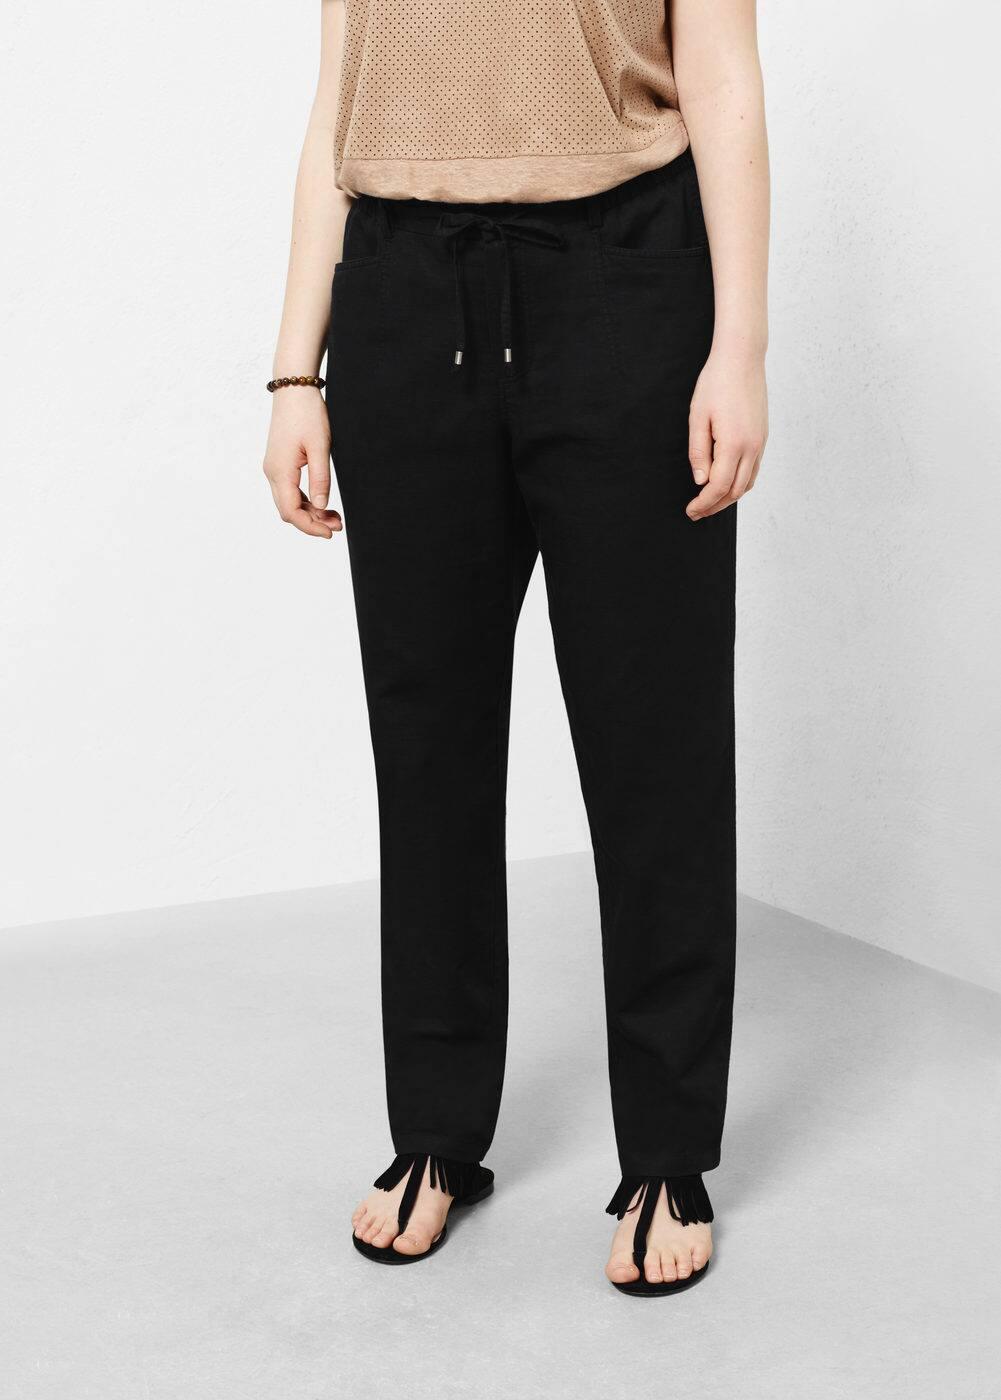 Cotton linen-blend trousers | VIOLETA BY MANGO